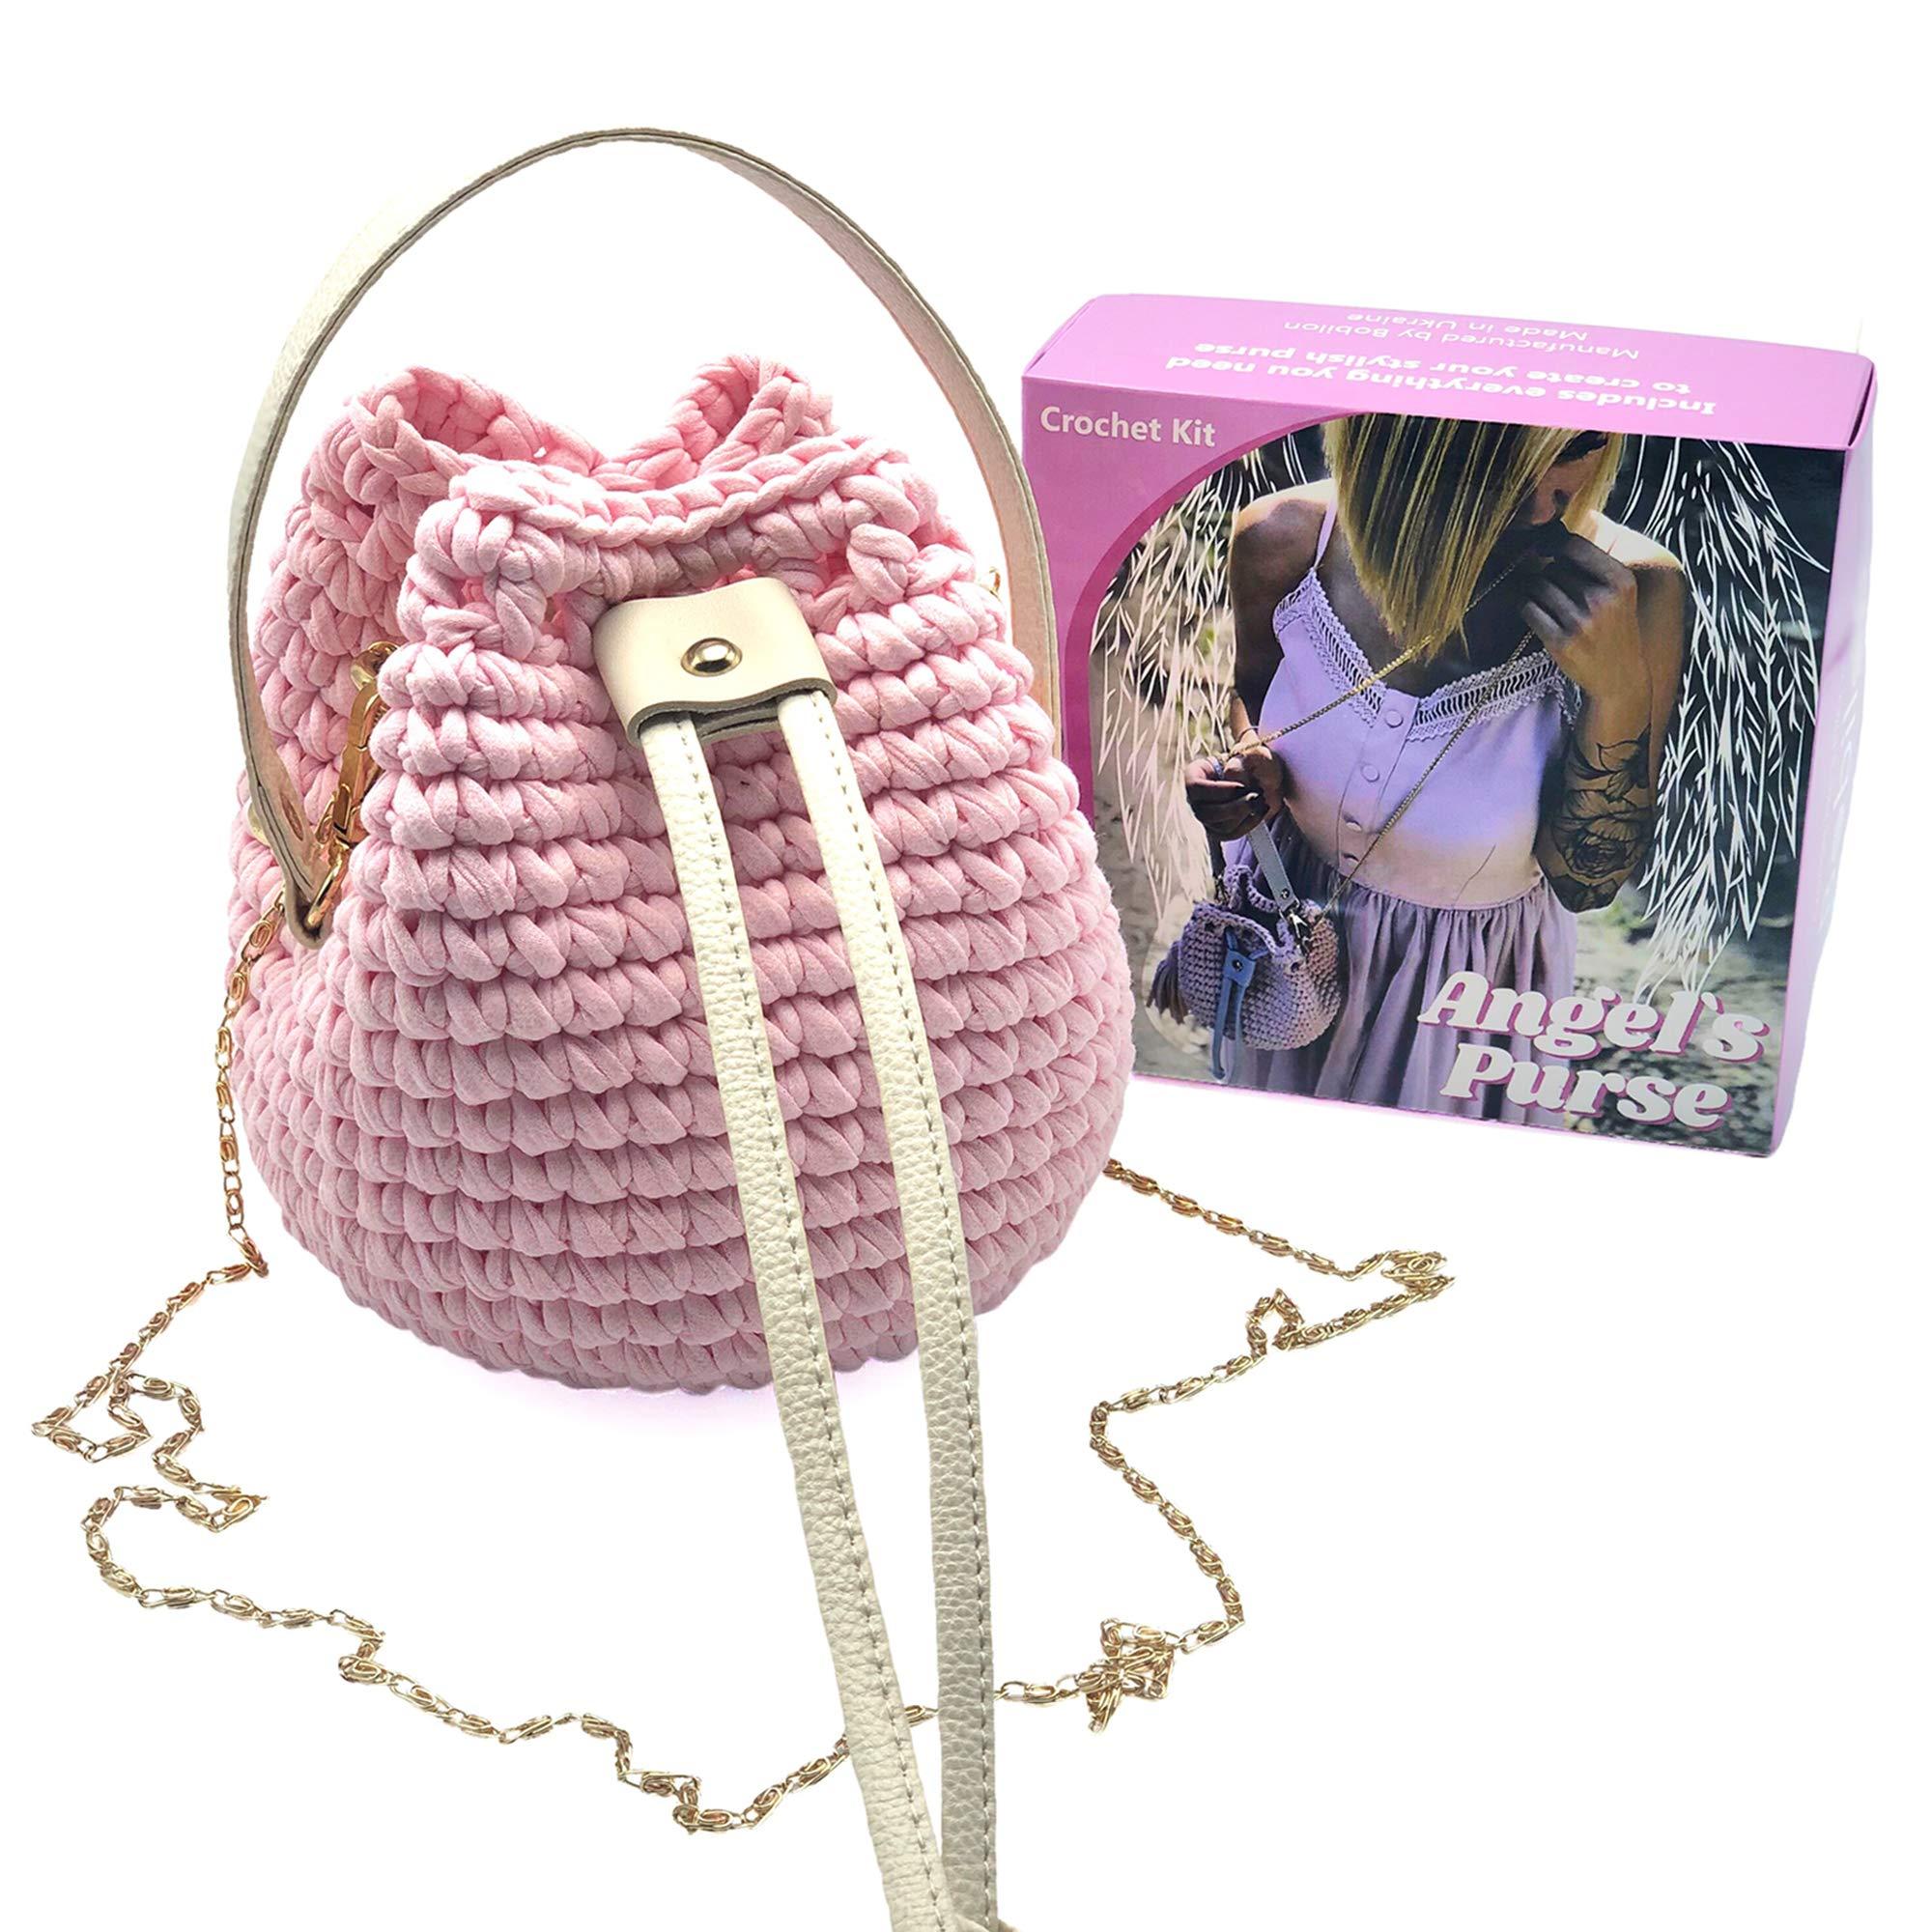 T-Shirt Yarn Fettuccini Zpagetti Set - Angel's Purse Kit - 1 Ball Total of 130 Yards - Tshirt Yarn for Crocheting - Ribbon Yarn 100% Cotton - Knitting Yarn Ball - T Yarn Organic - T-Yarn Blush Pink